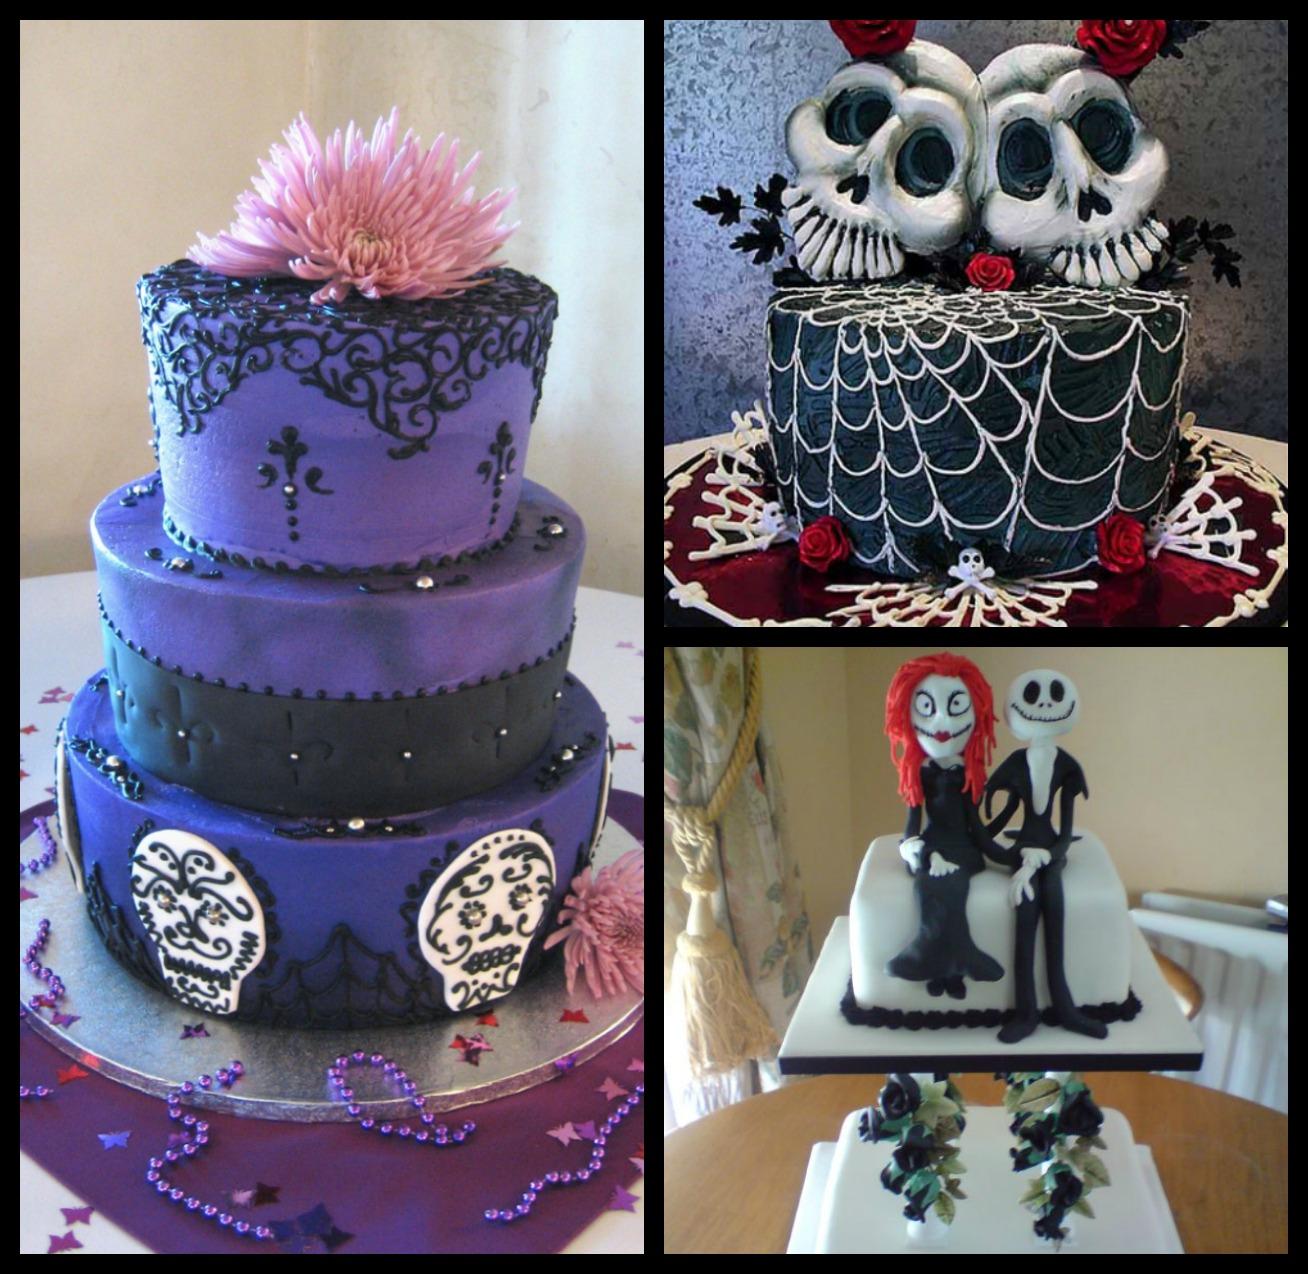 Black Gothic Wedding Cake Viewing Gallery